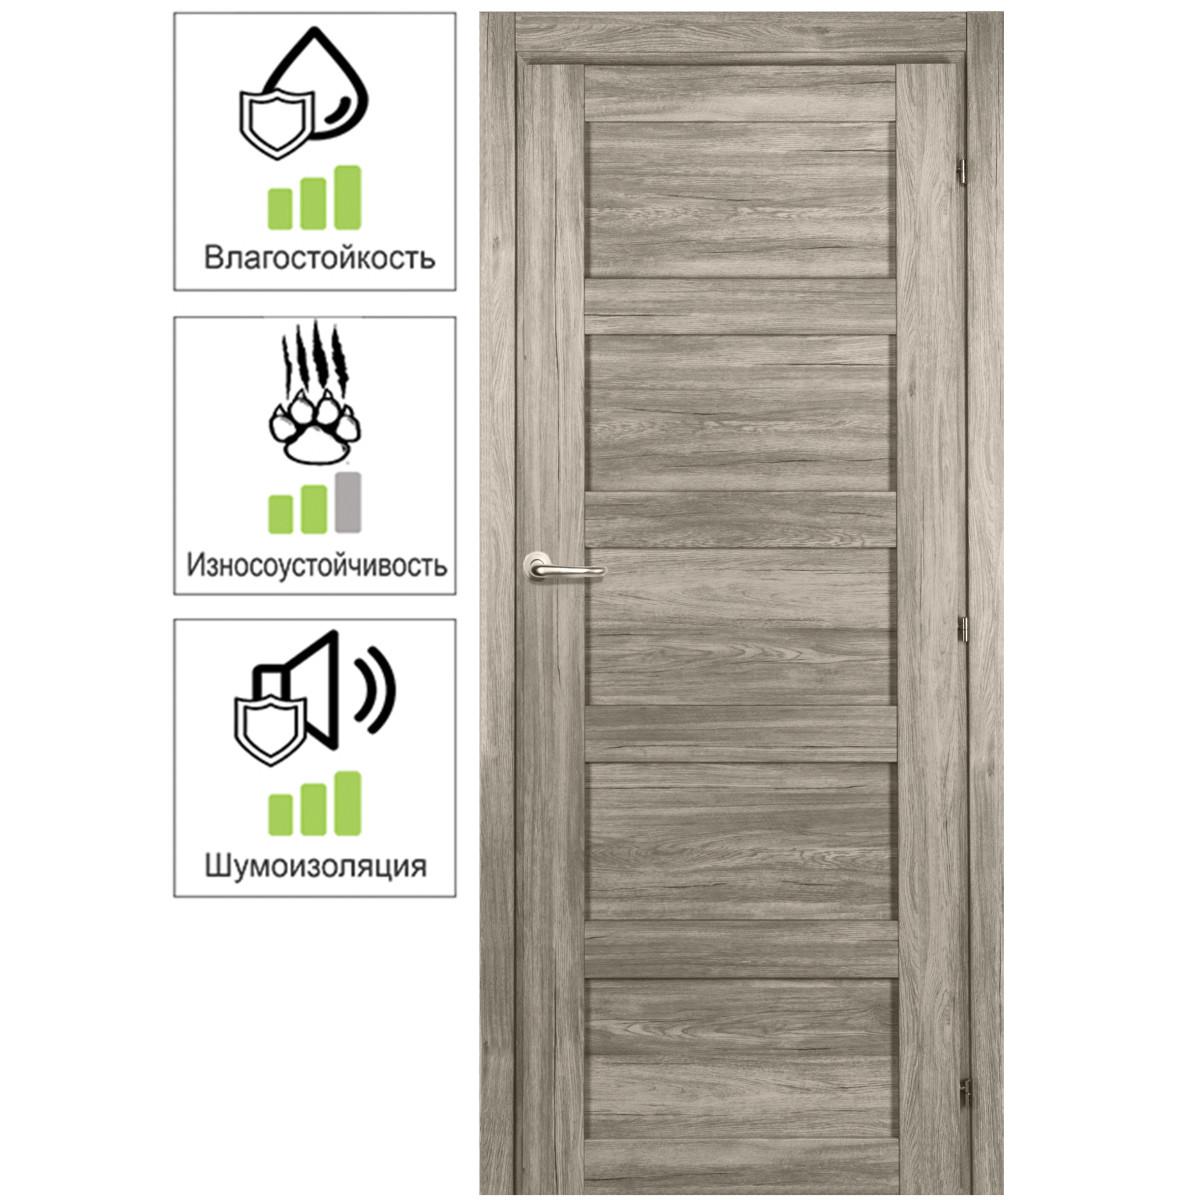 Дверь межкомнатная Прэсто 80х200 см ПВХ цвет дуб санремо светлый  с фурнитурой